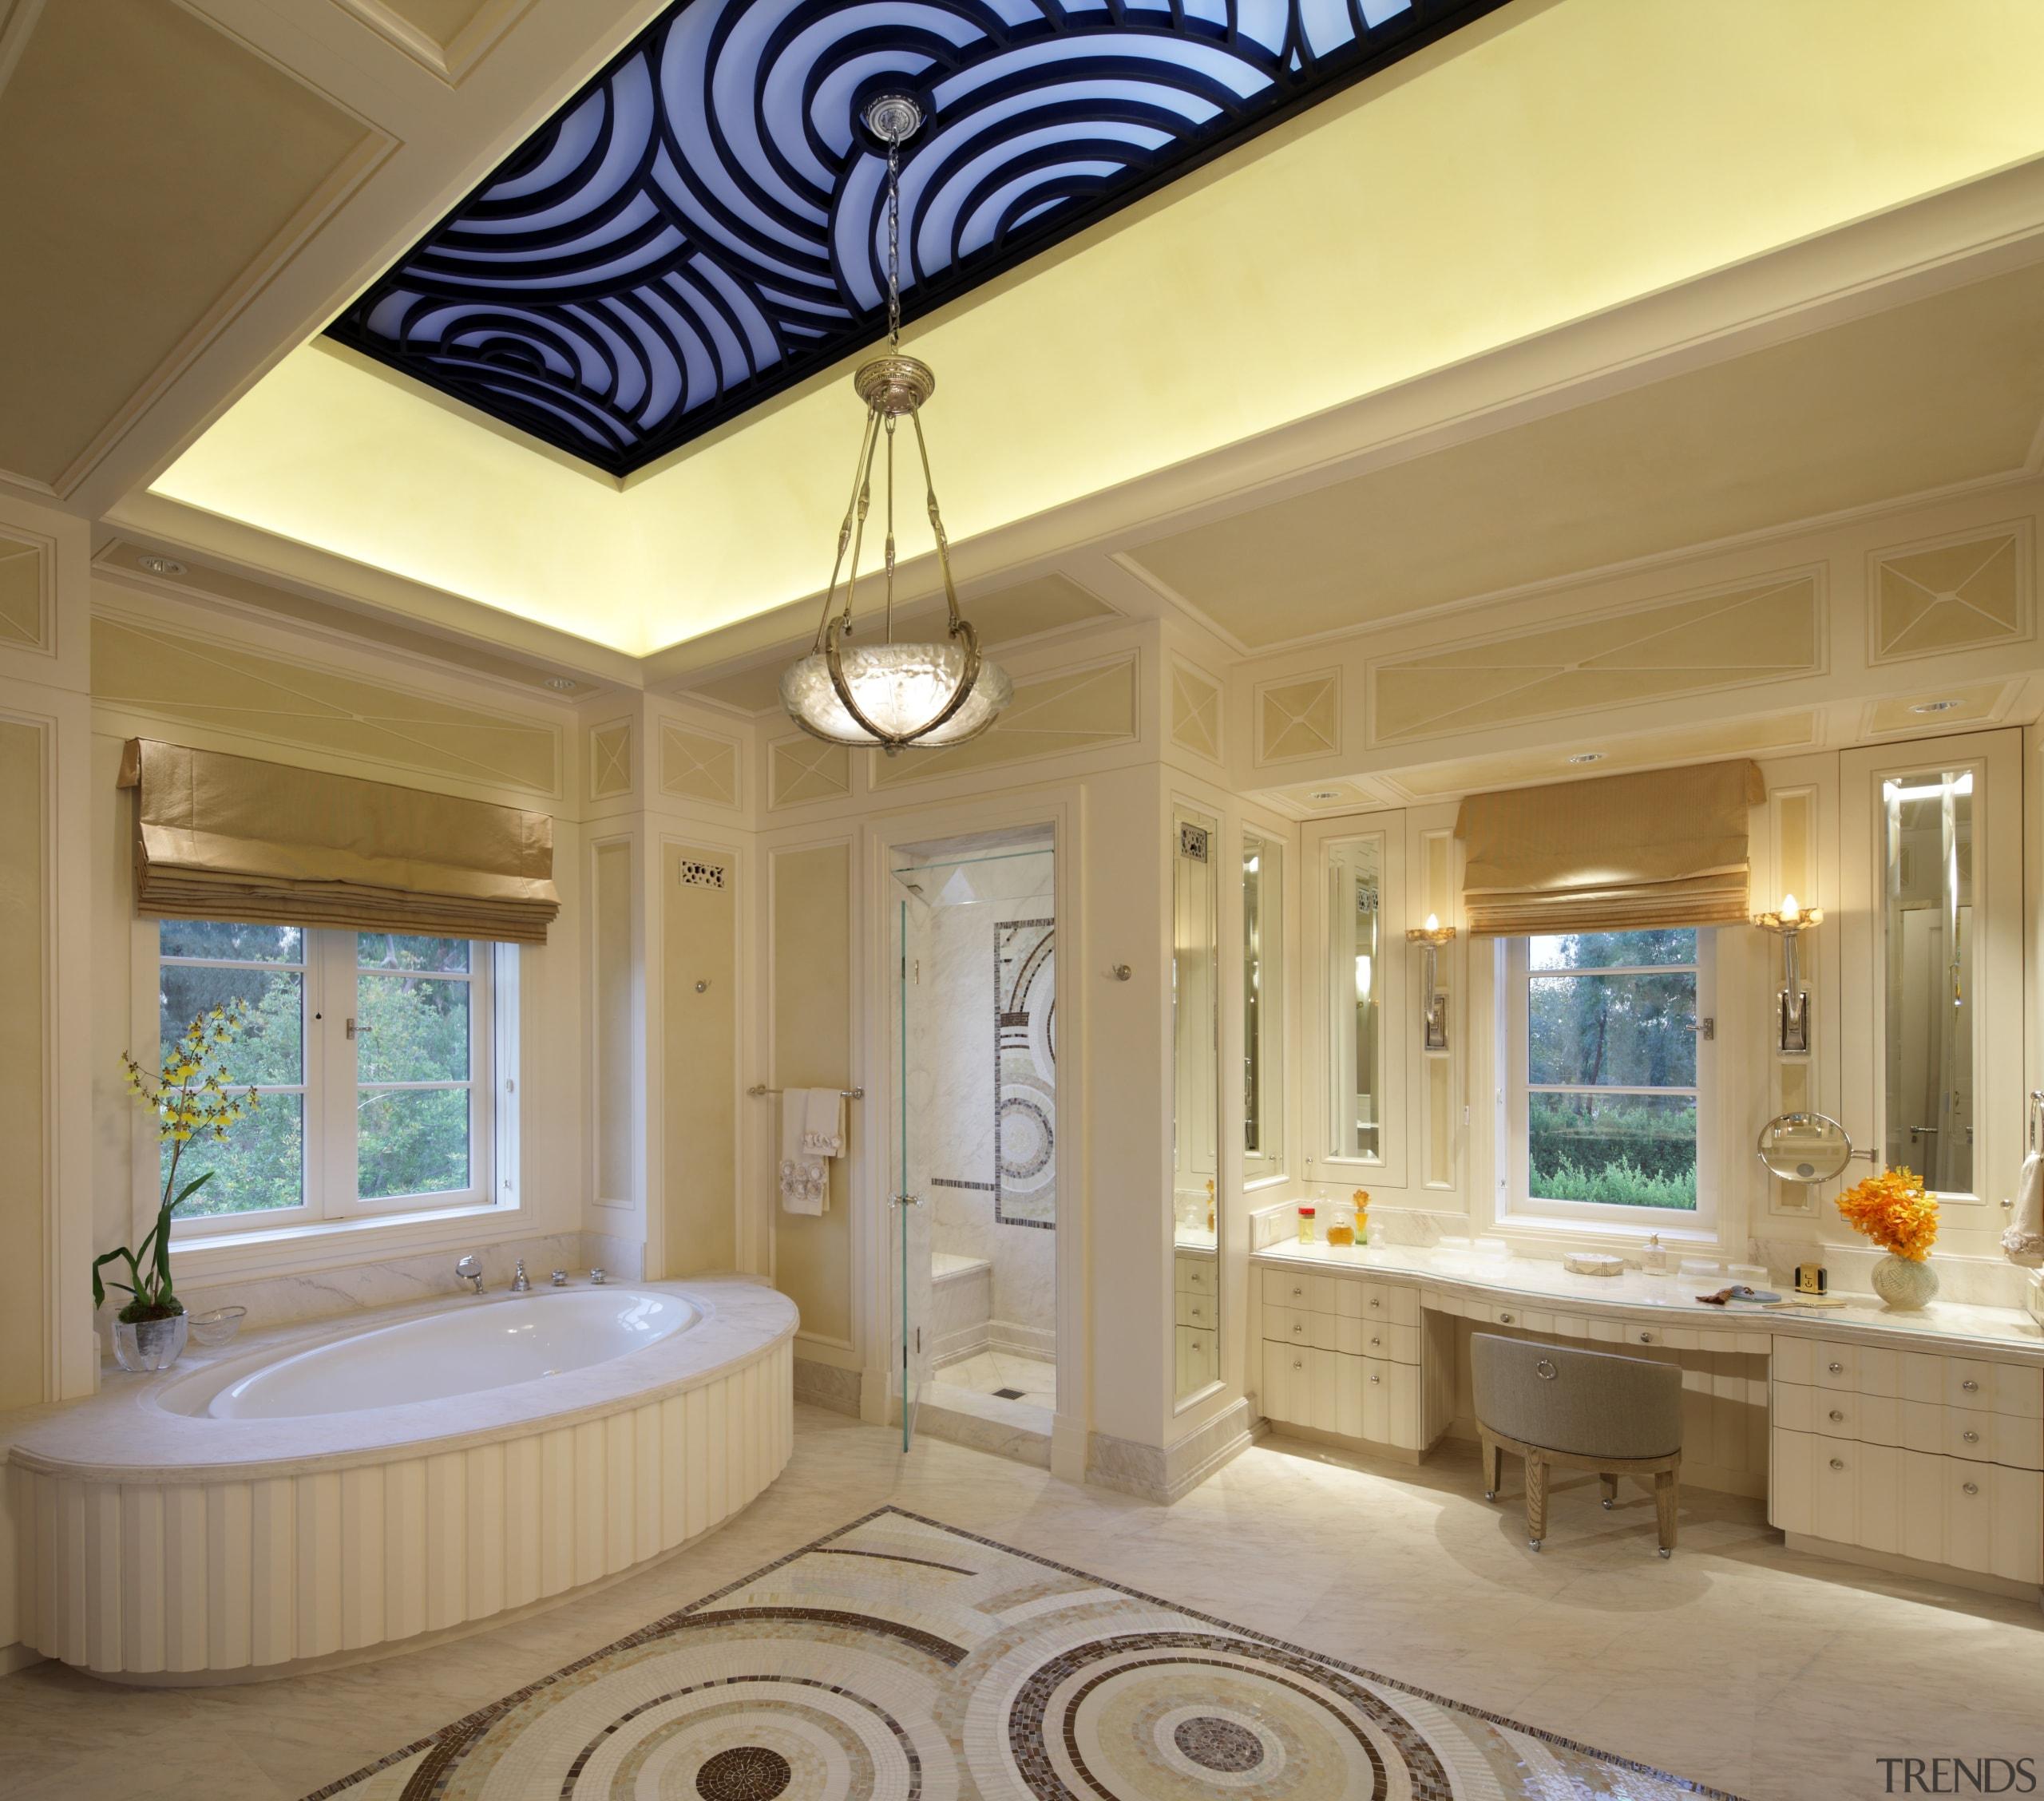 This ornate master bathroom is in an Italian bathroom, ceiling, daylighting, estate, floor, flooring, home, interior design, living room, property, real estate, room, tile, wall, window, brown